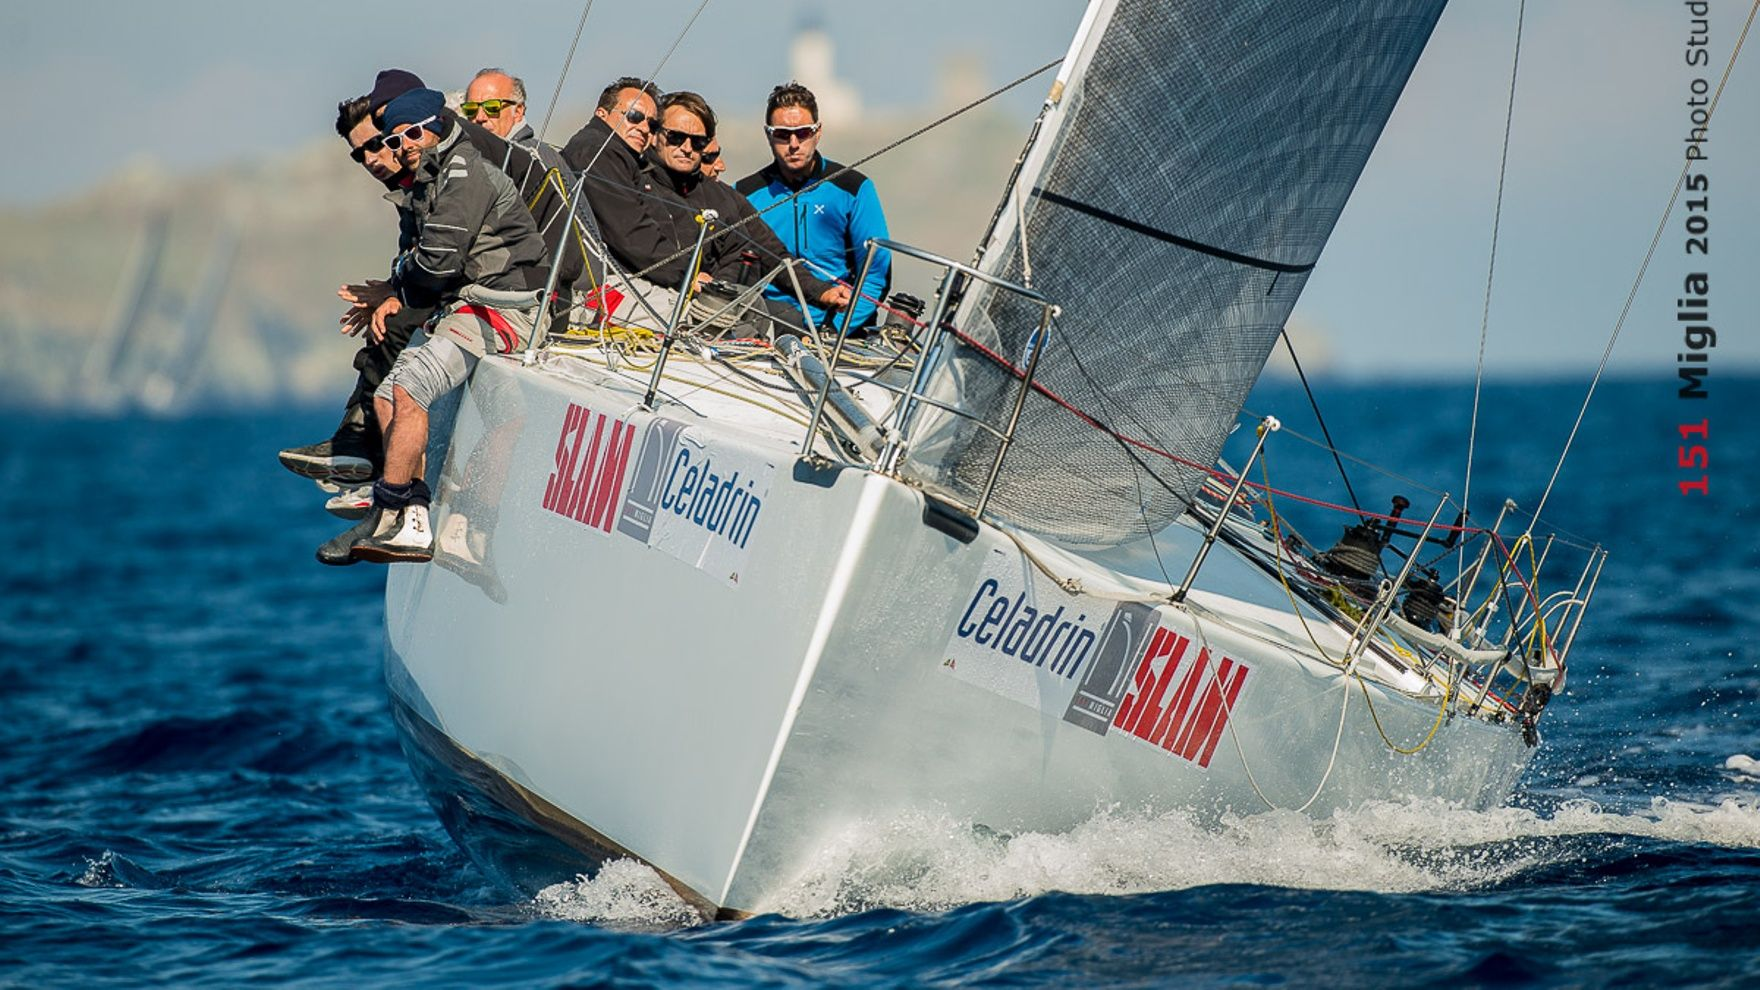 151 Miglia - Trofeo Cetilar regatta